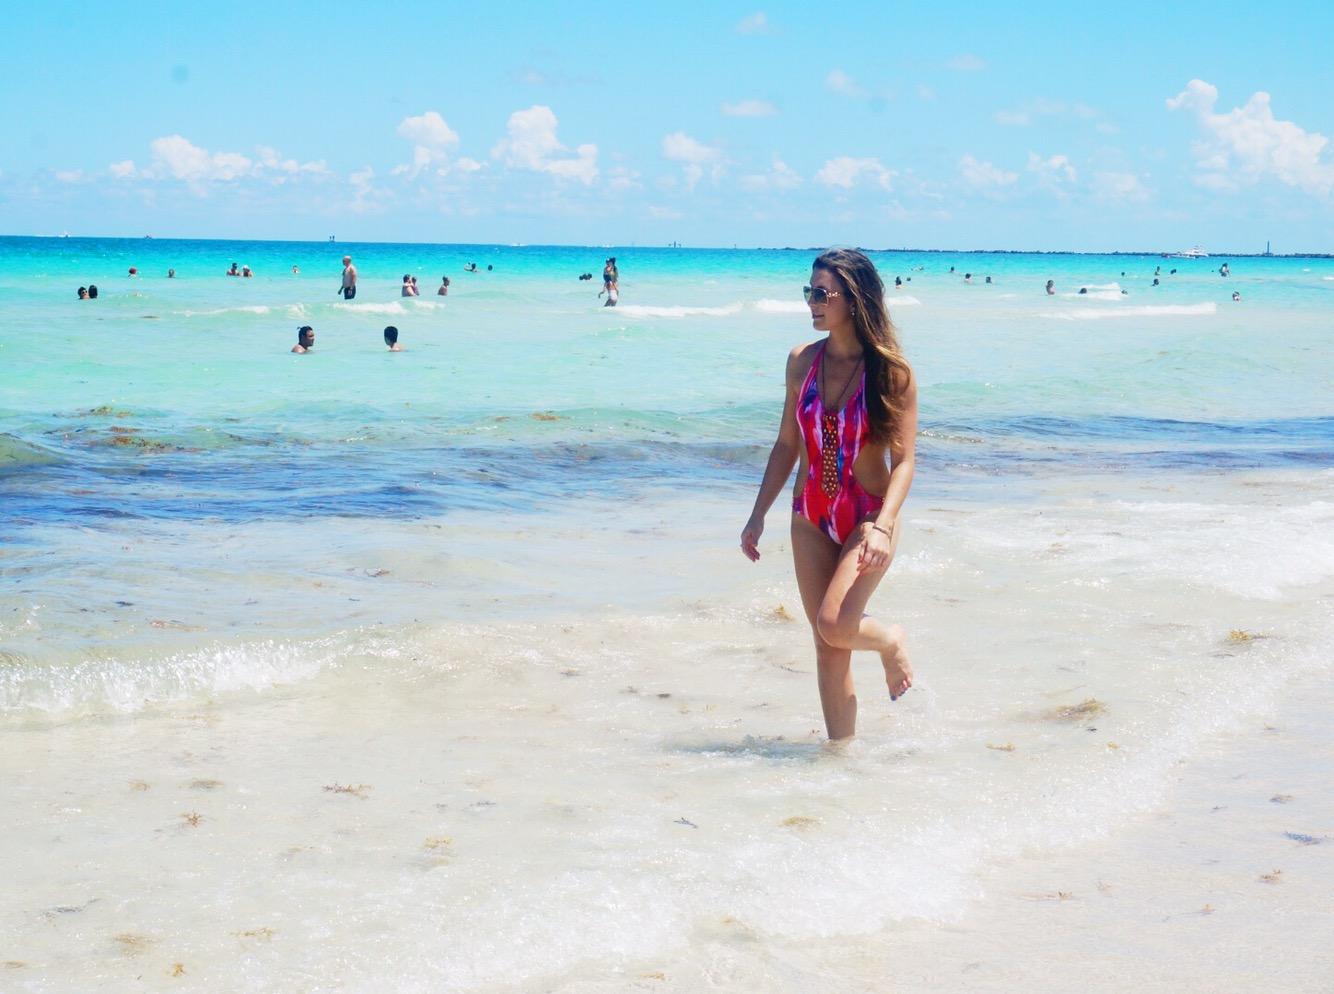 Staycation: The Diplomat Beach Resort